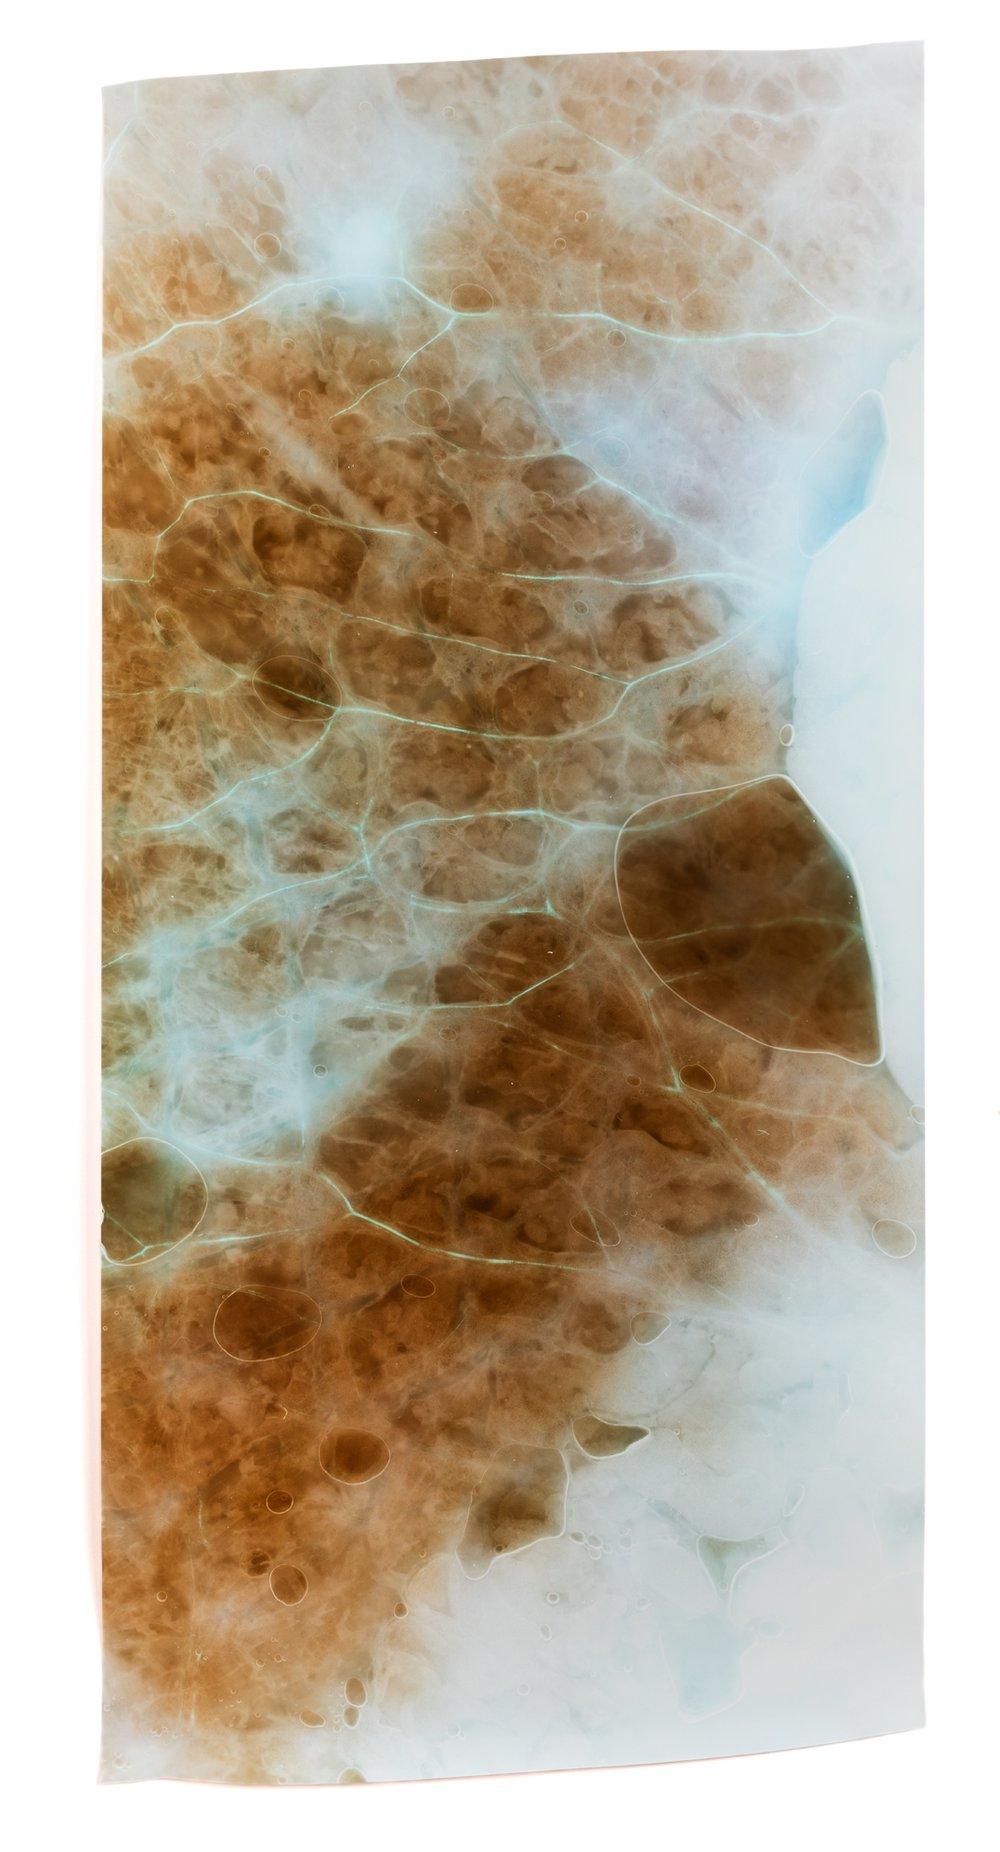 Skin from a ROCKY® Free Range Chicken Thigh